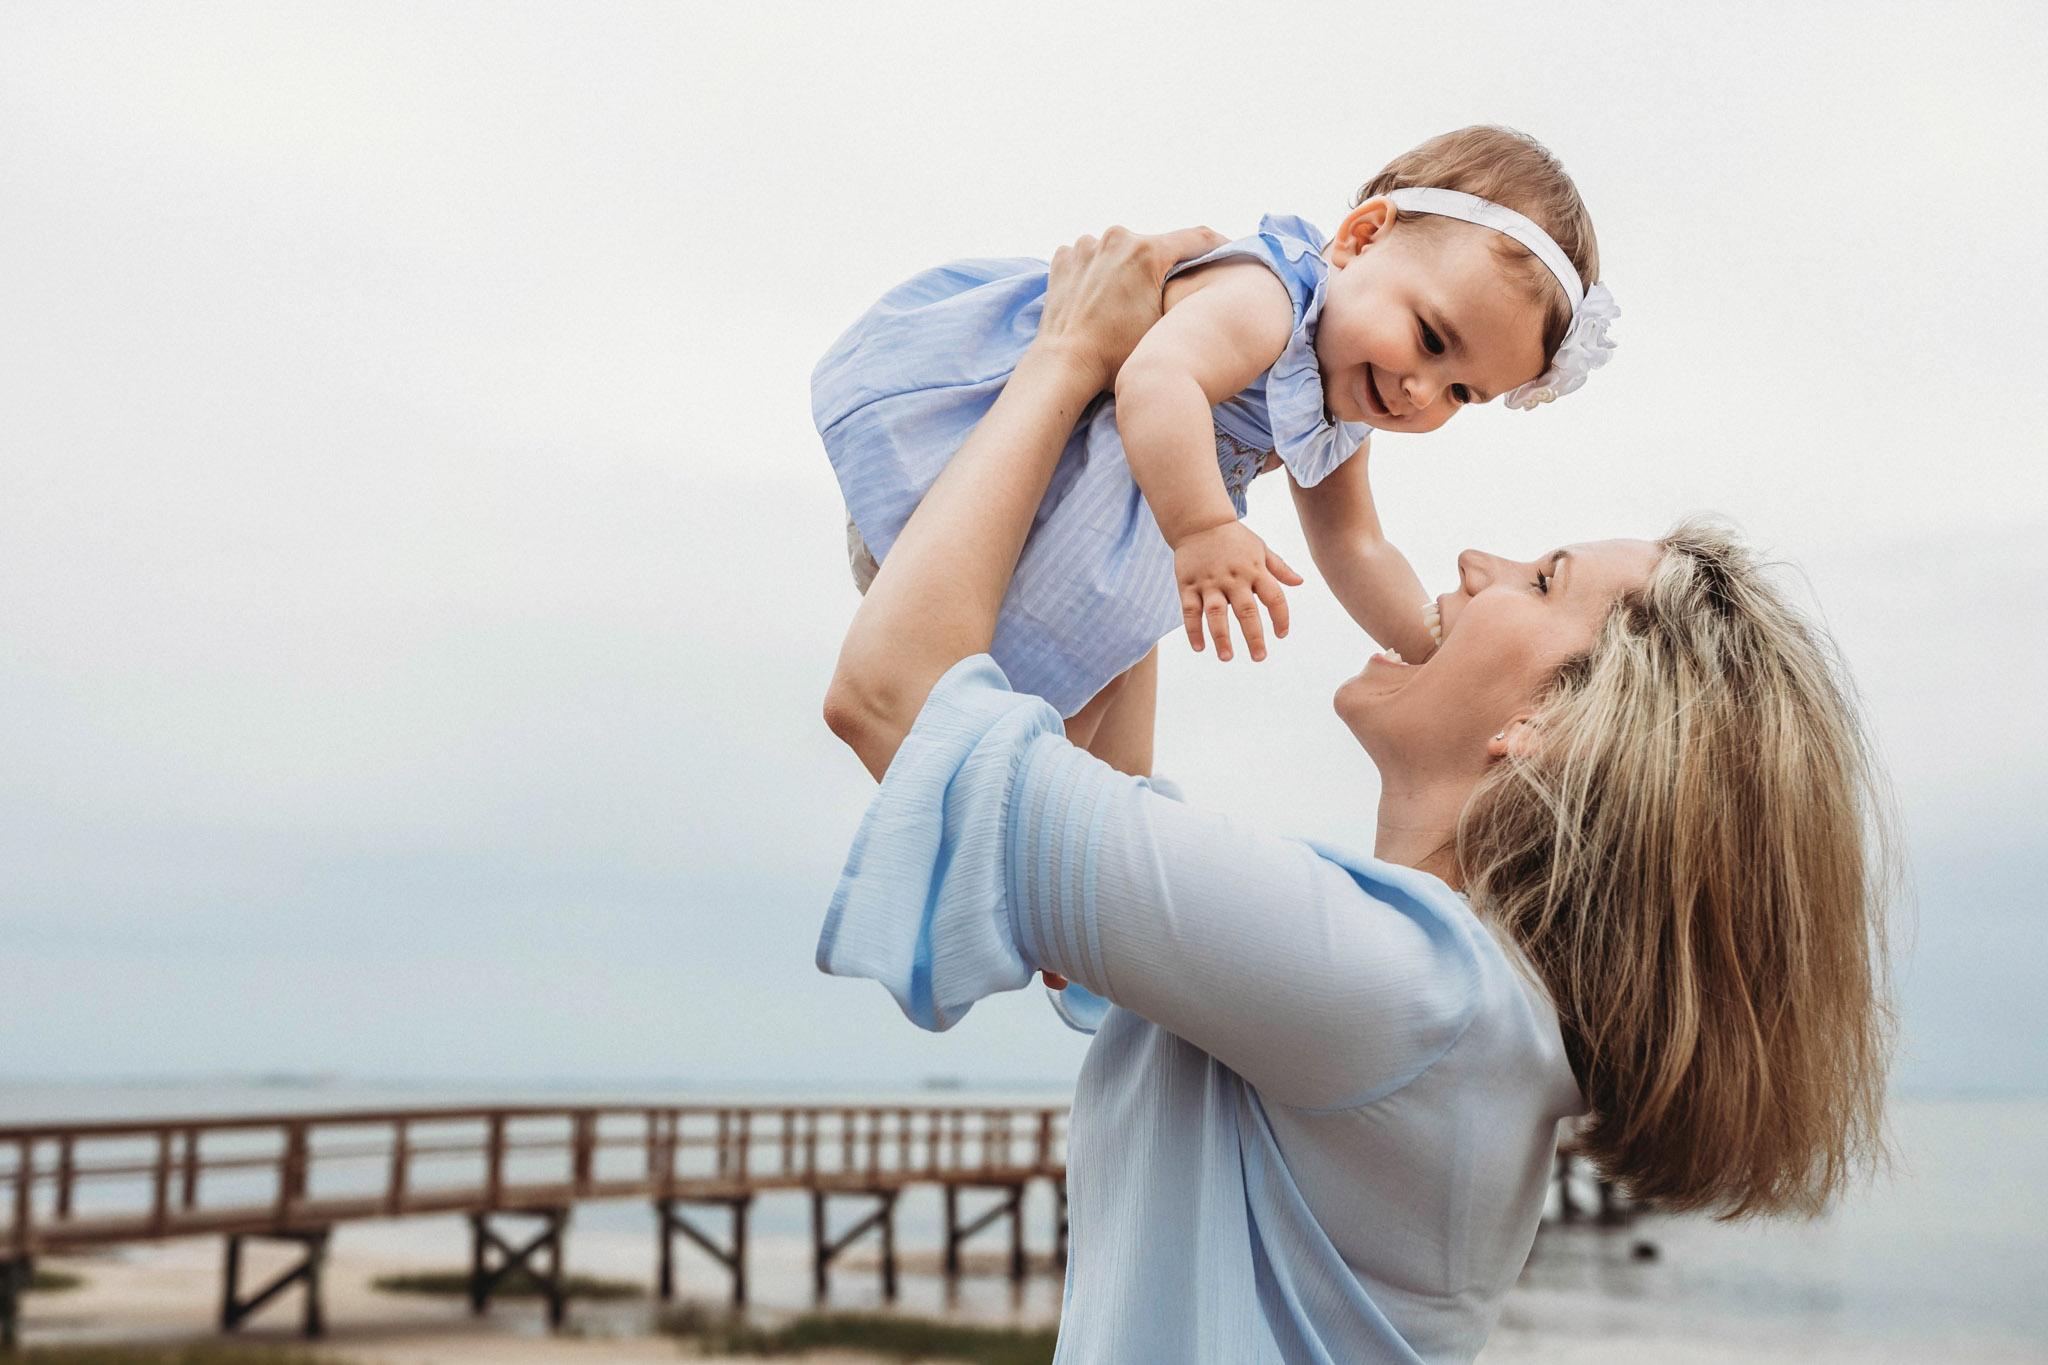 Tampa Family Photographer_Jennifer Kielich Photography_Jill S Family For Blog-20.jpg